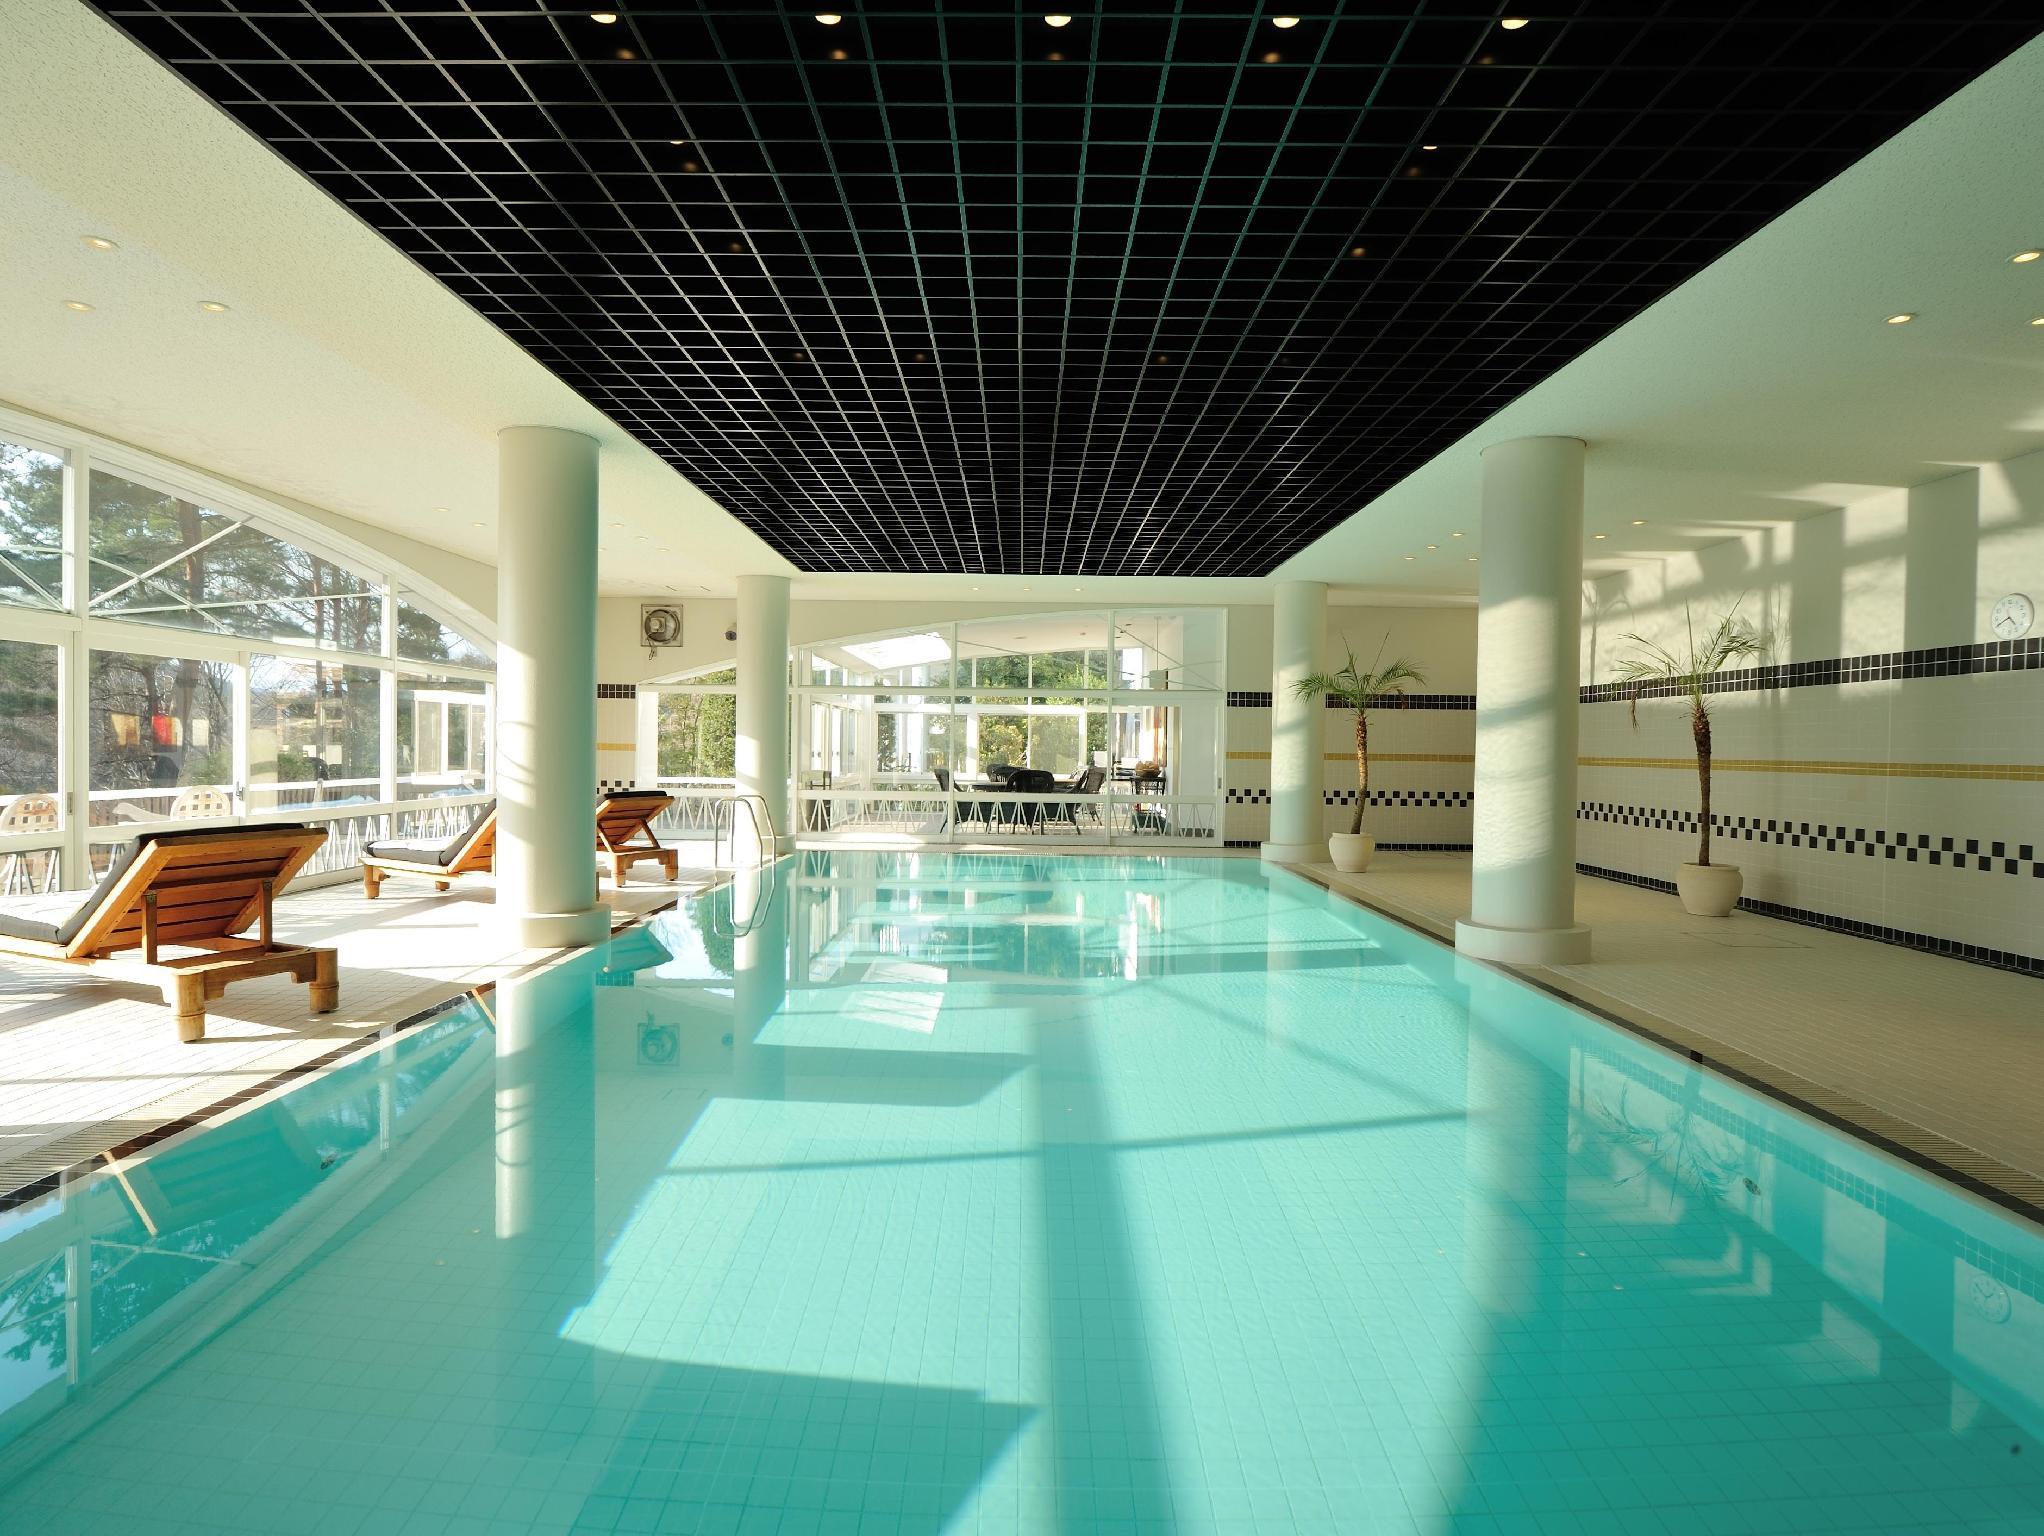 尾道廣島機場飯店 (Hiroshima Airport Hotel)線上訂房 Agoda.com